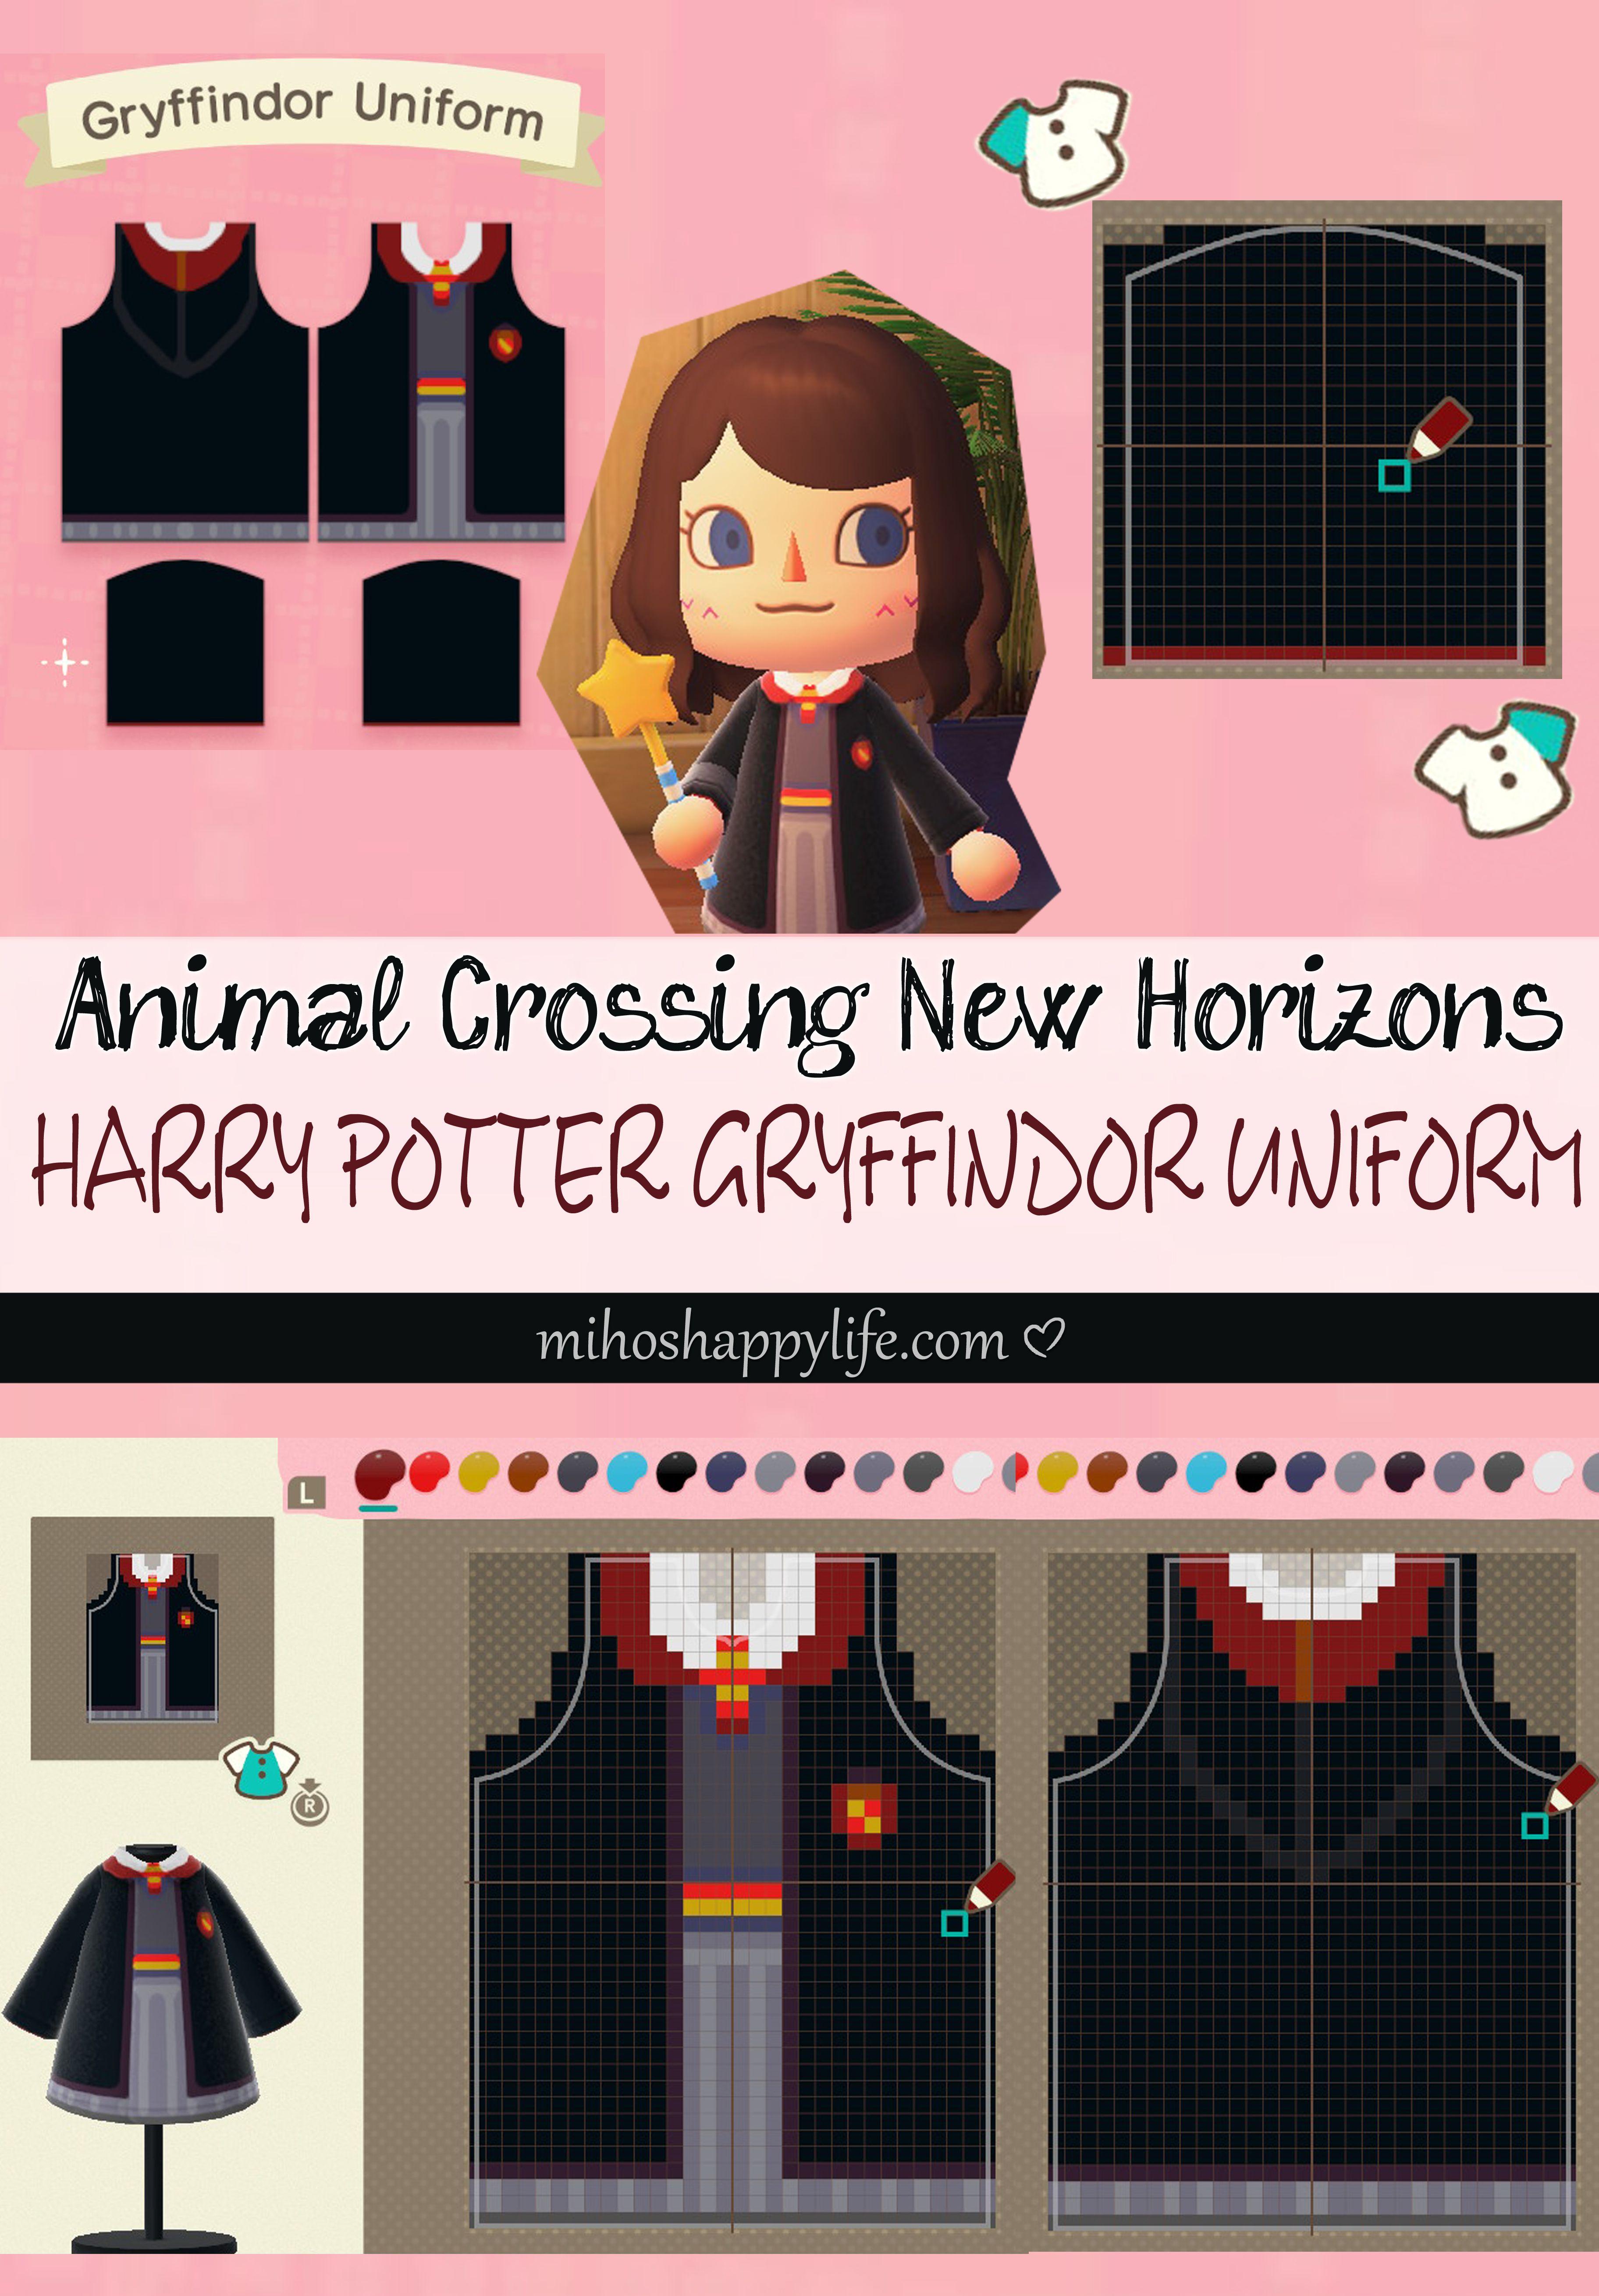 Animal Crossing New Horizons - Template Design Harry Potter Gryffindor Uniform